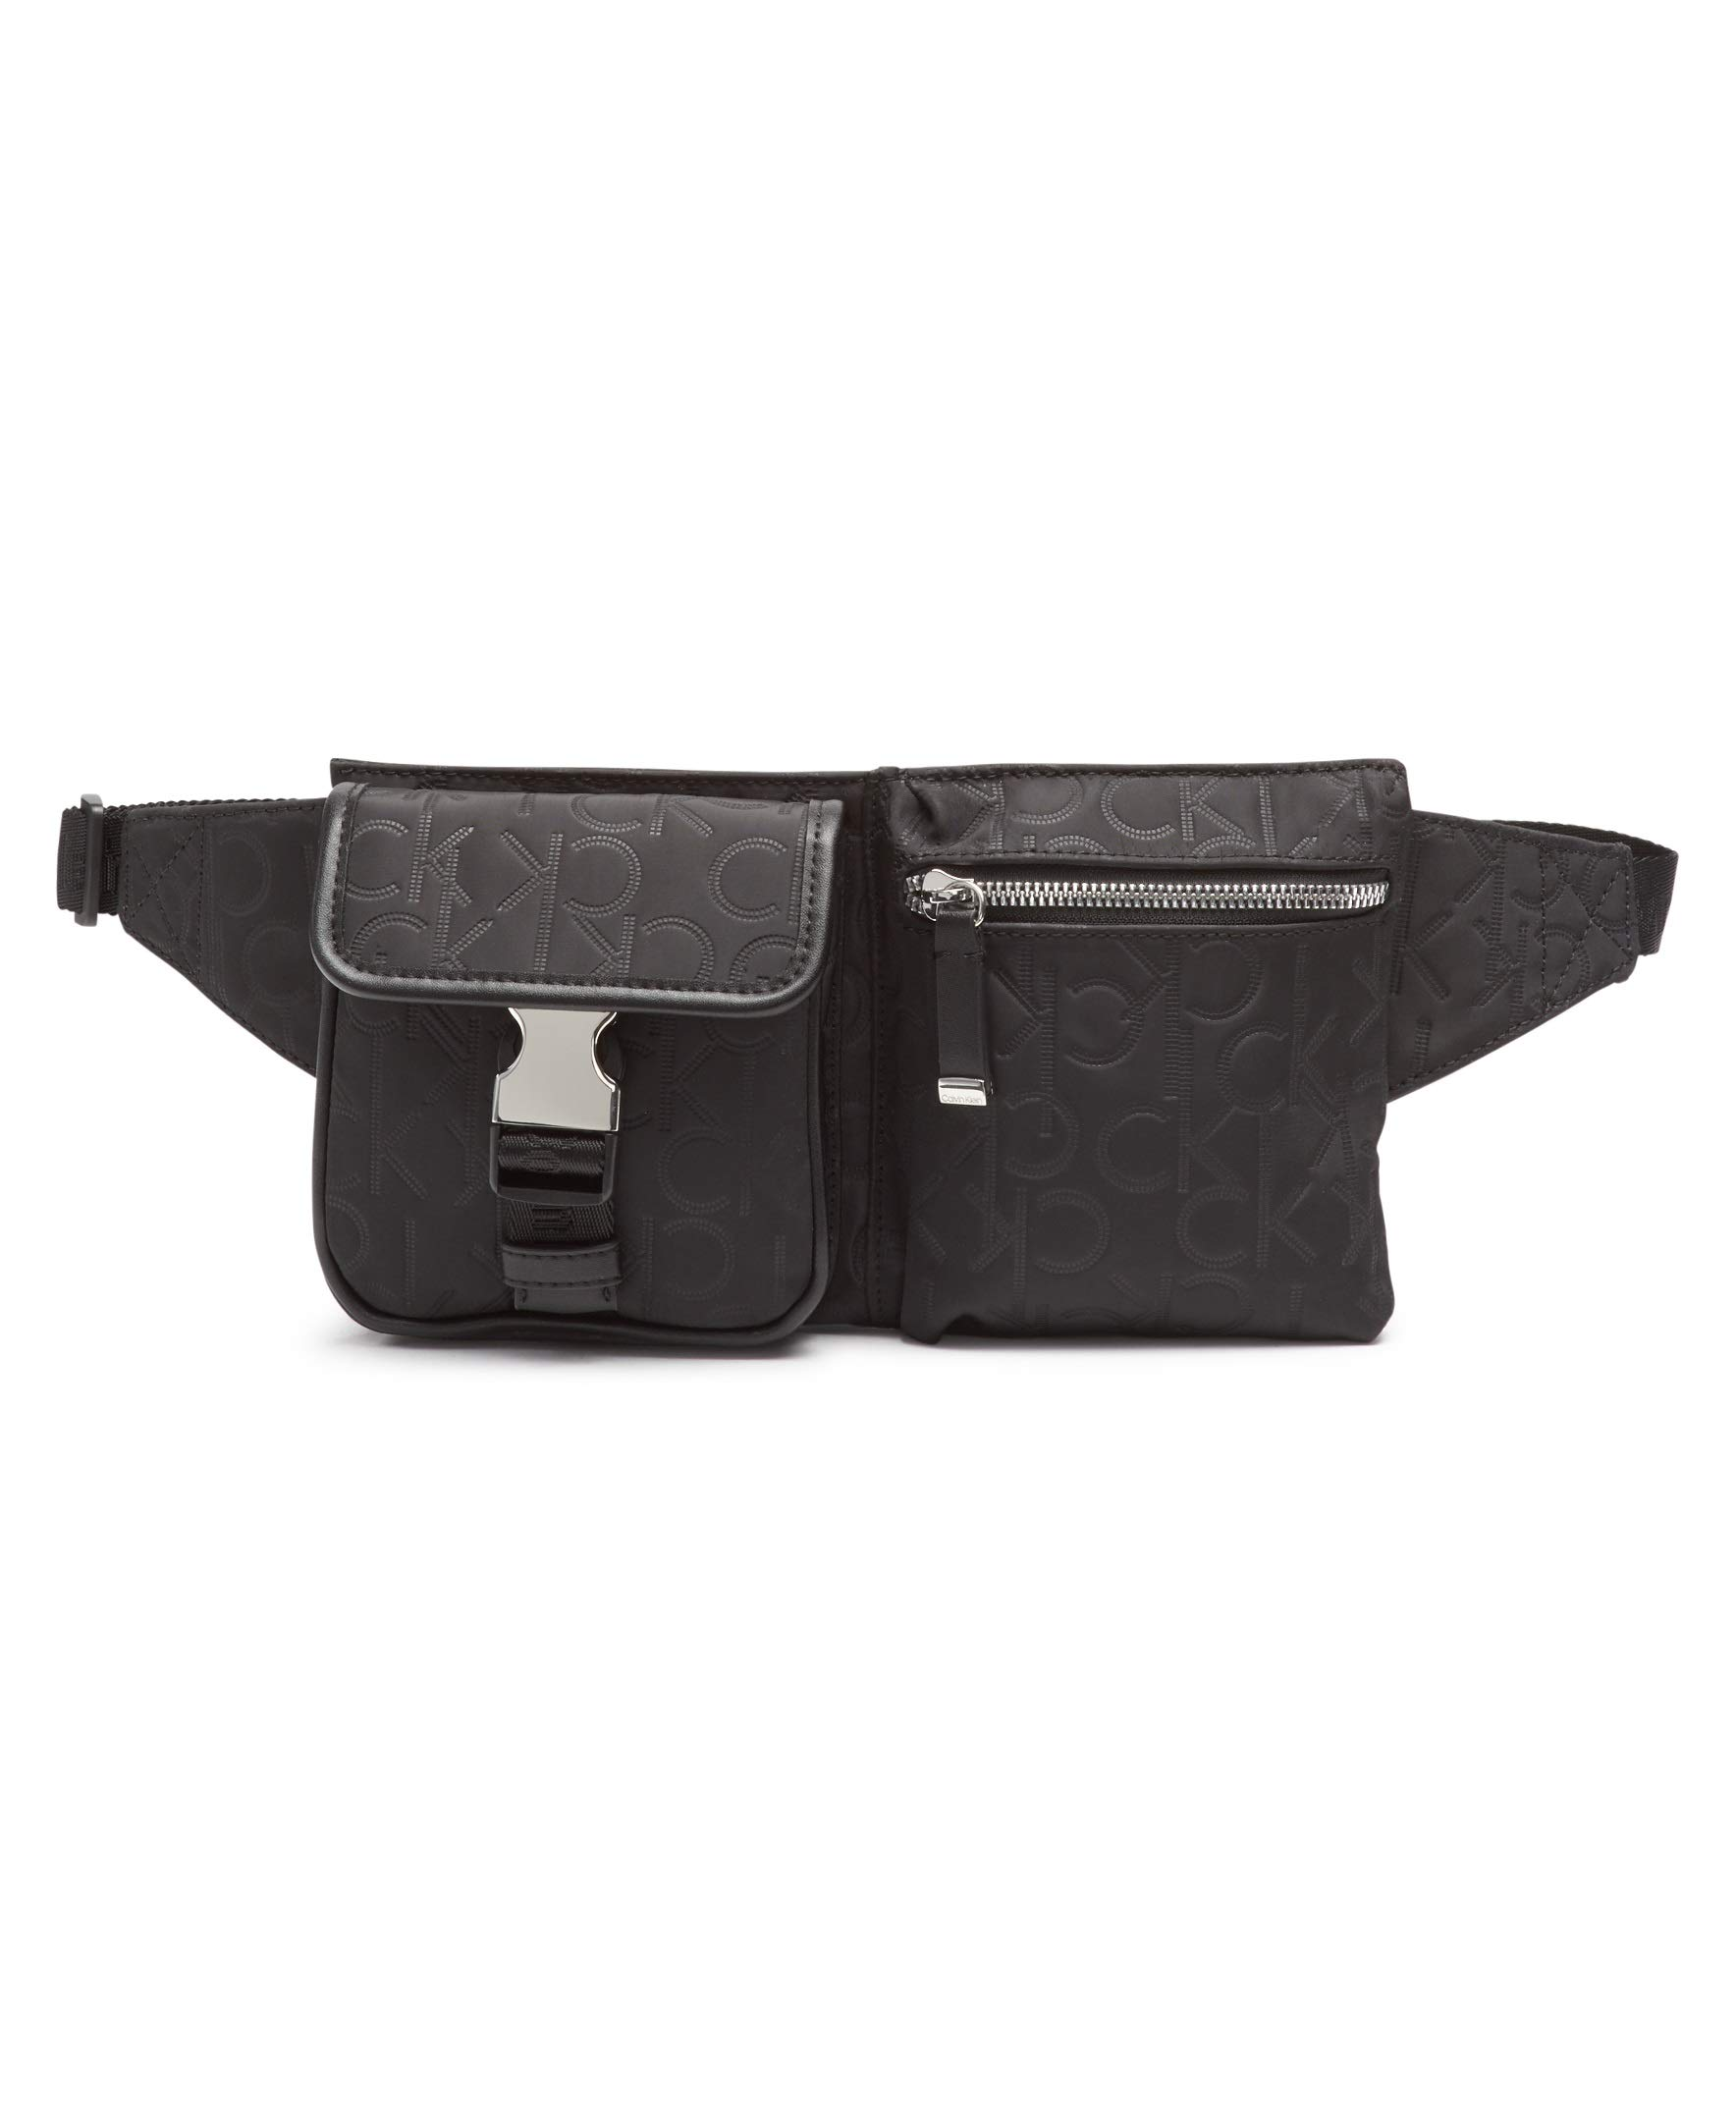 Calvin Klein Tandy Nylon Belt Bag, Black/Silver